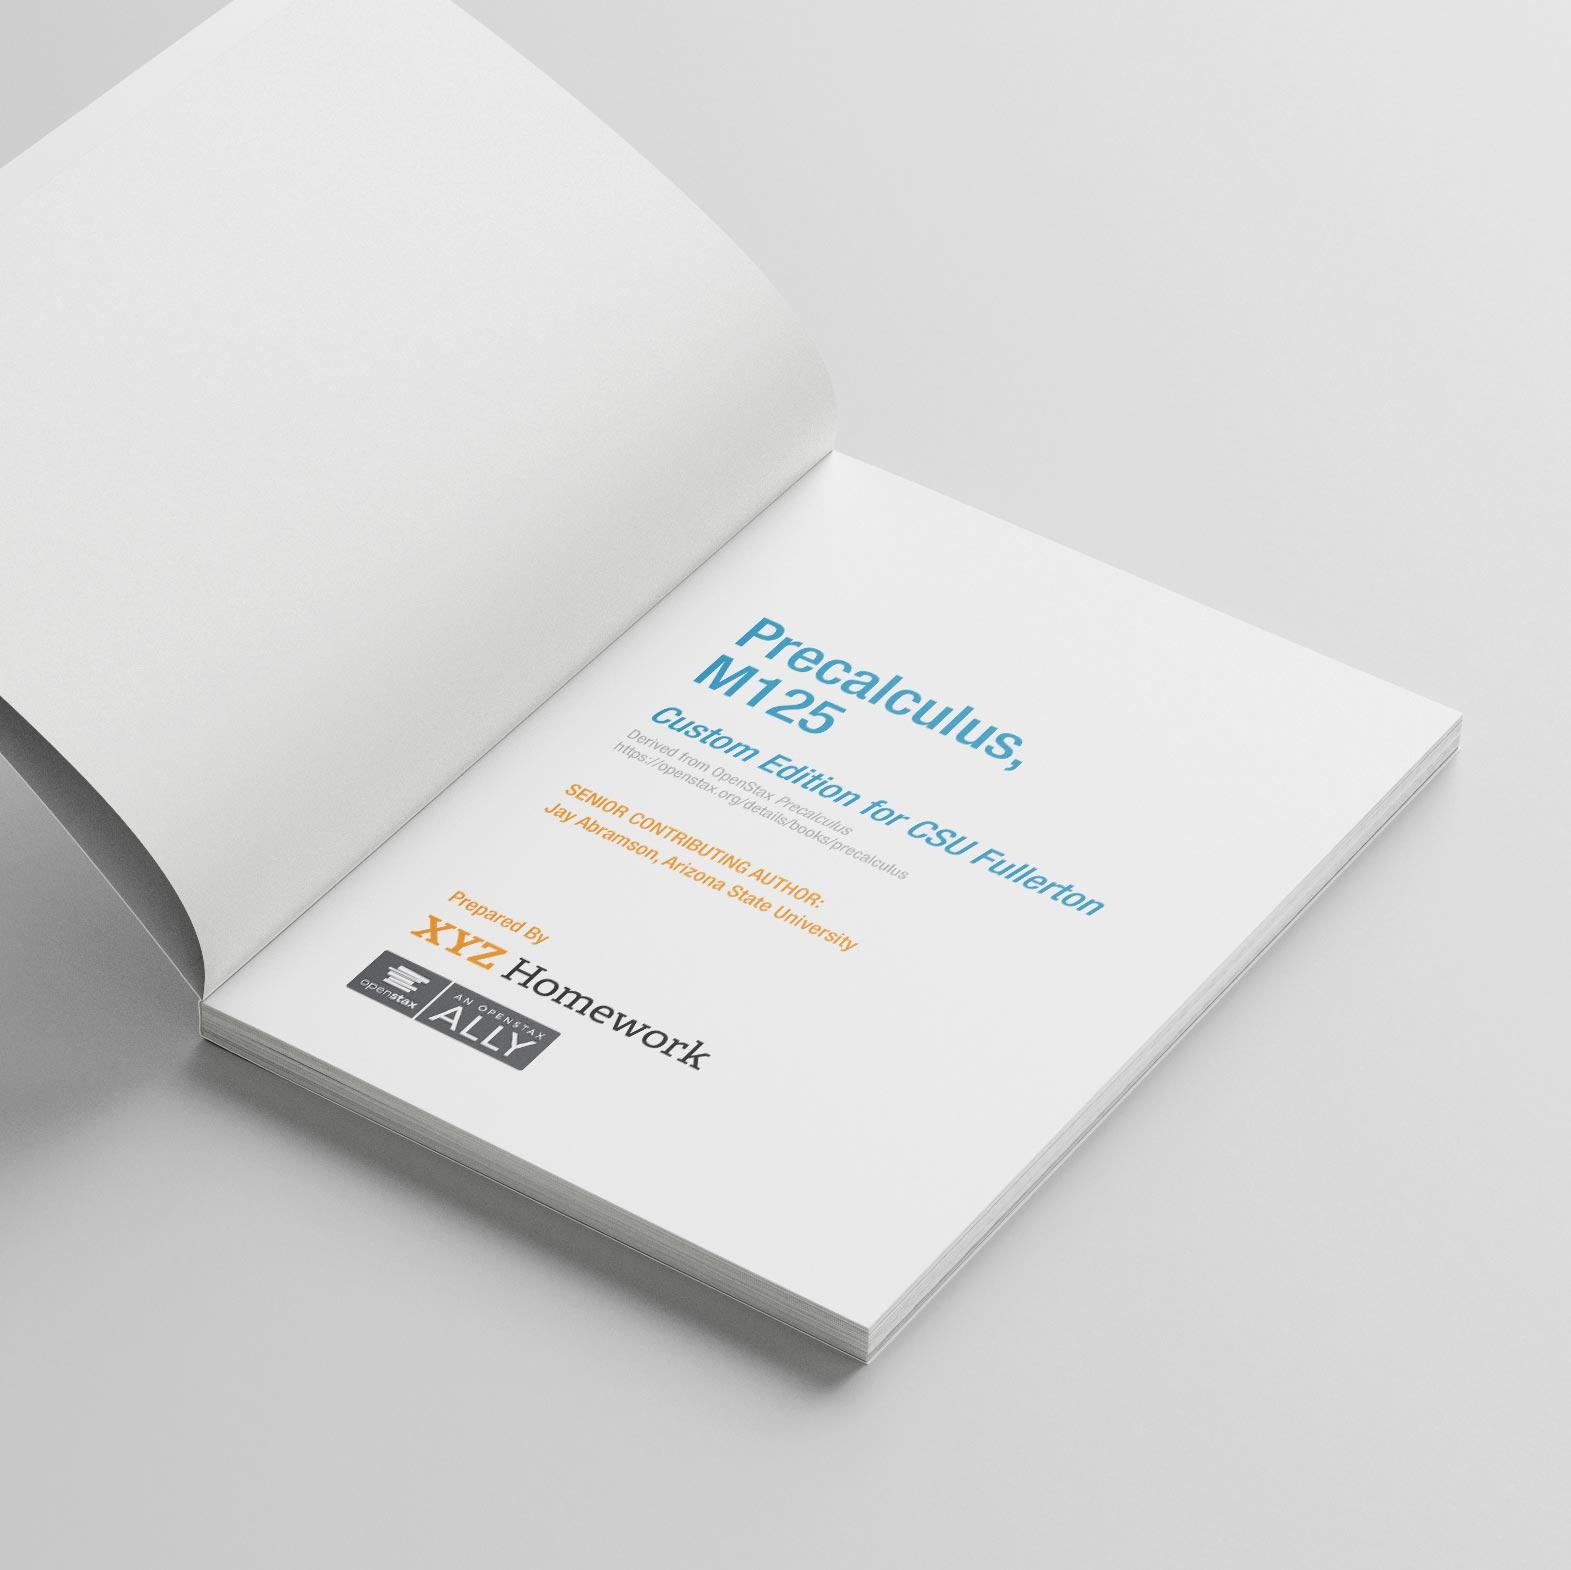 Custom Precalc textbook